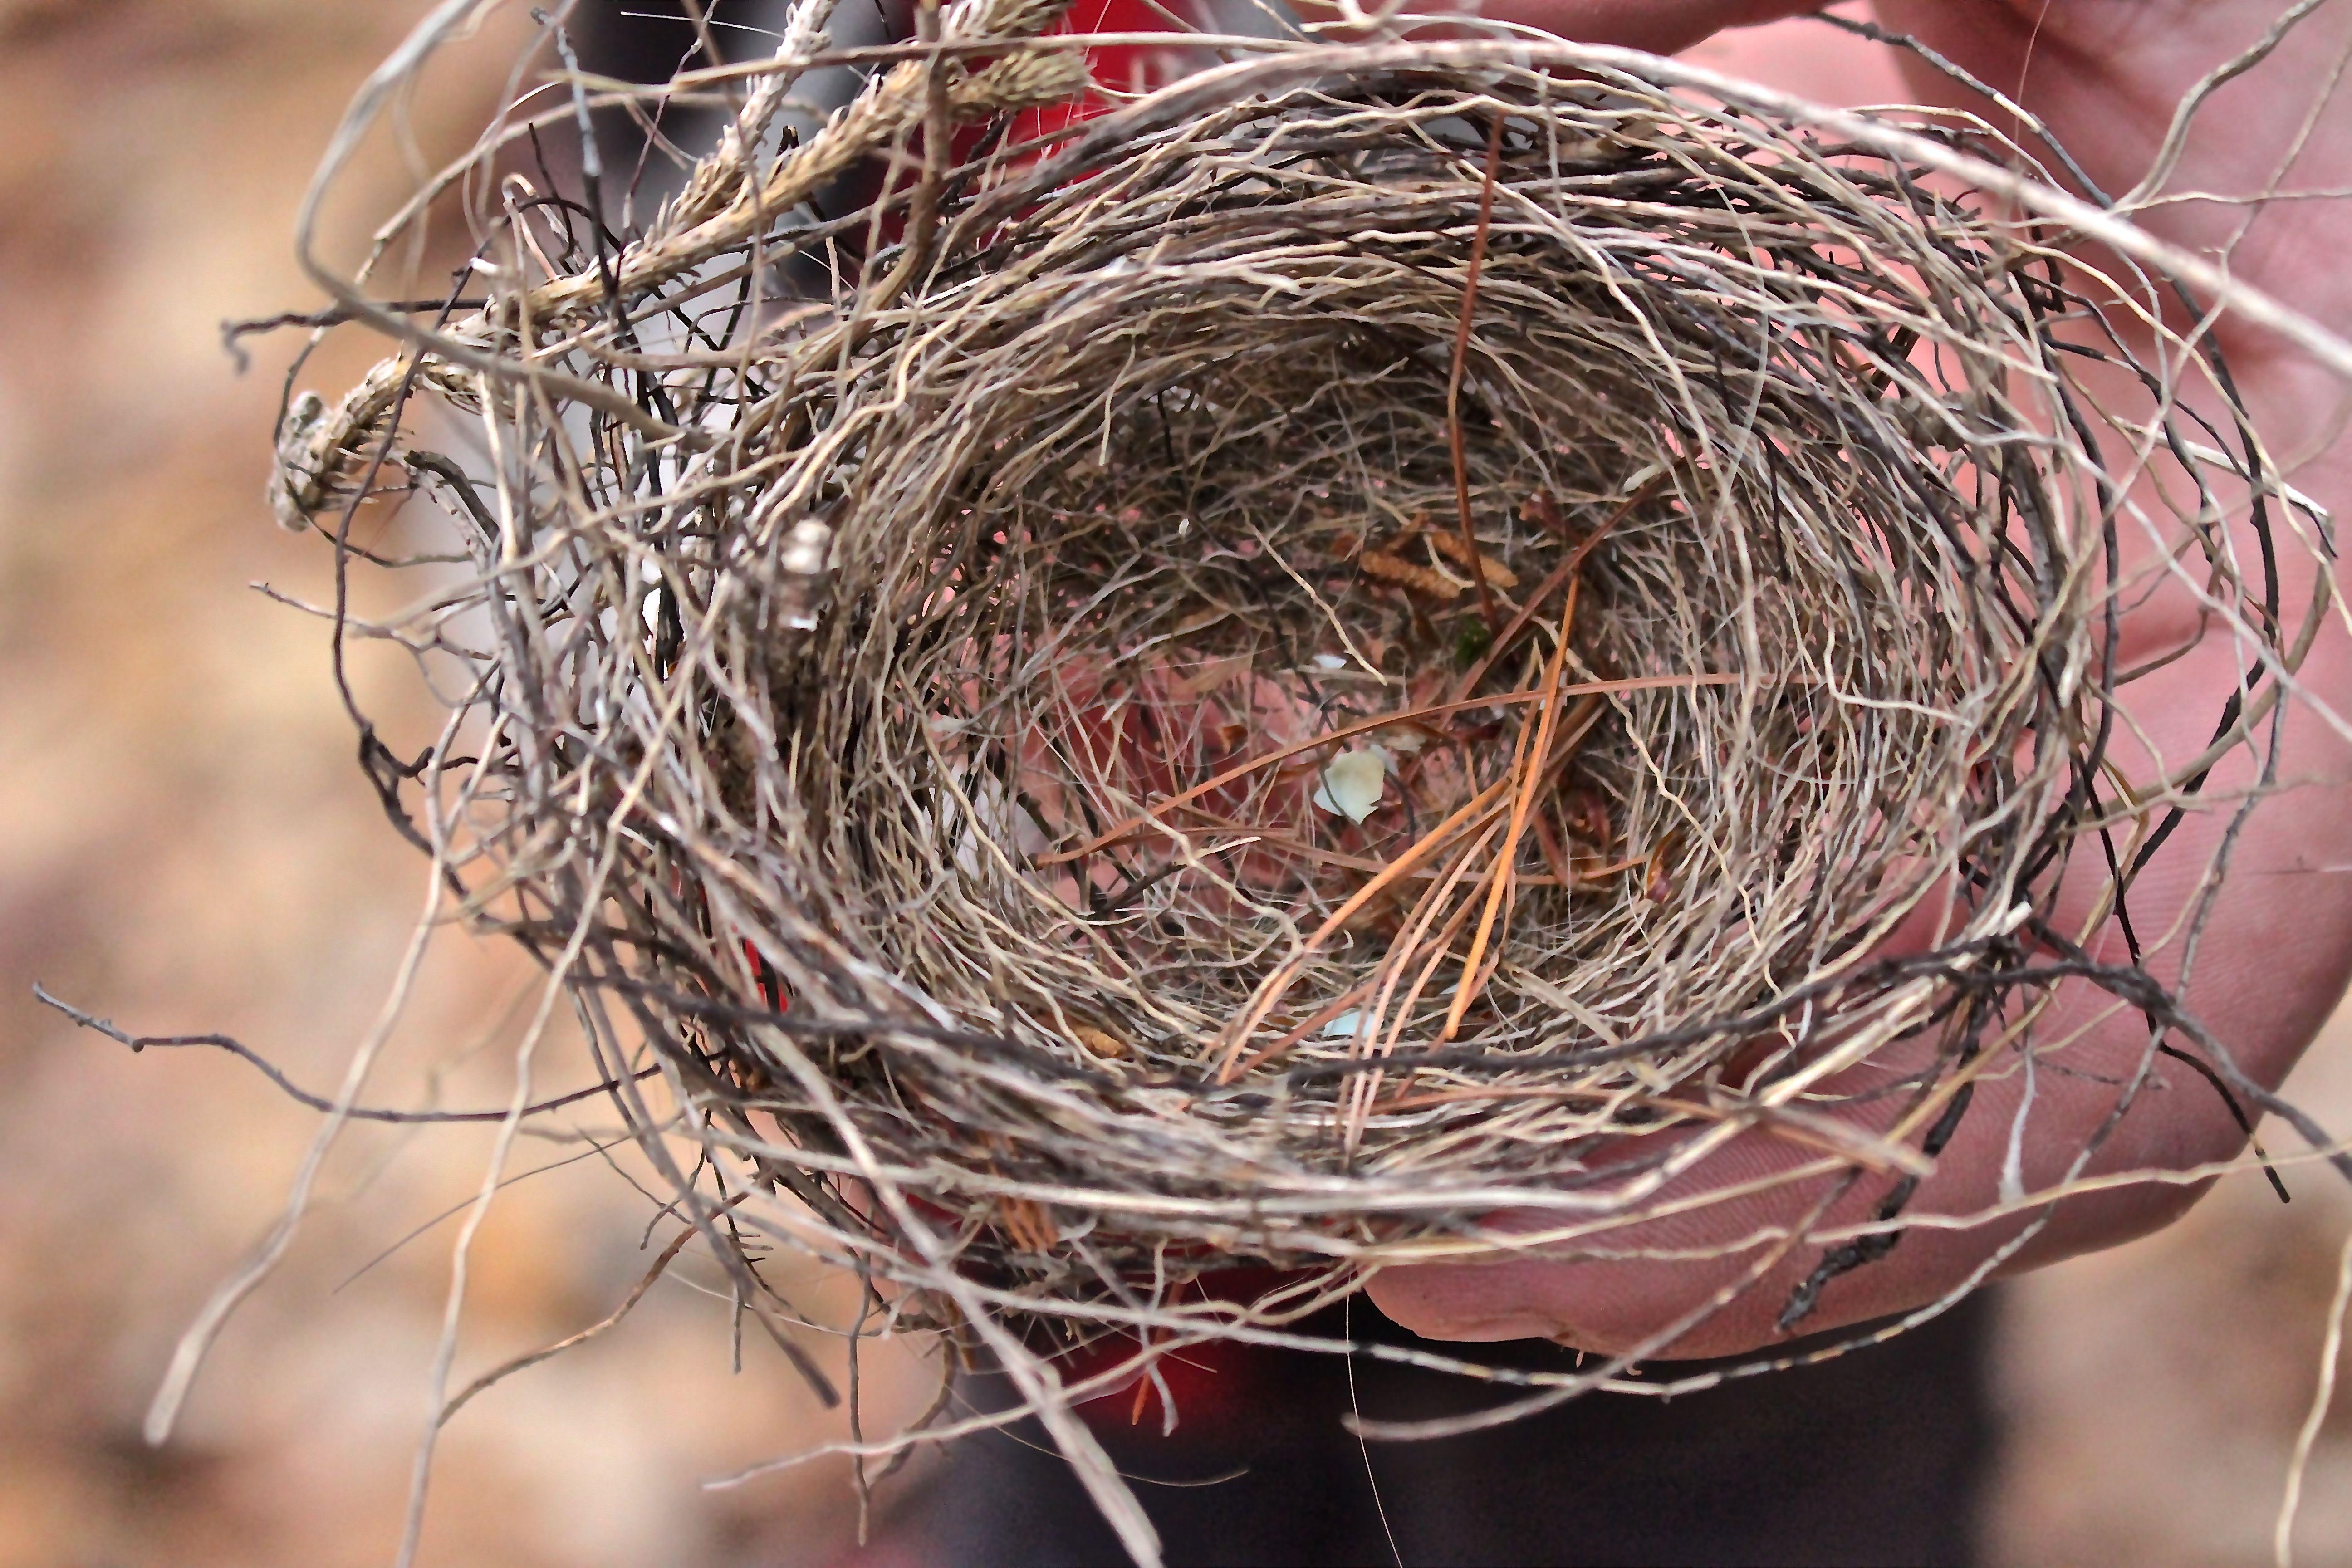 b-bird nest 1